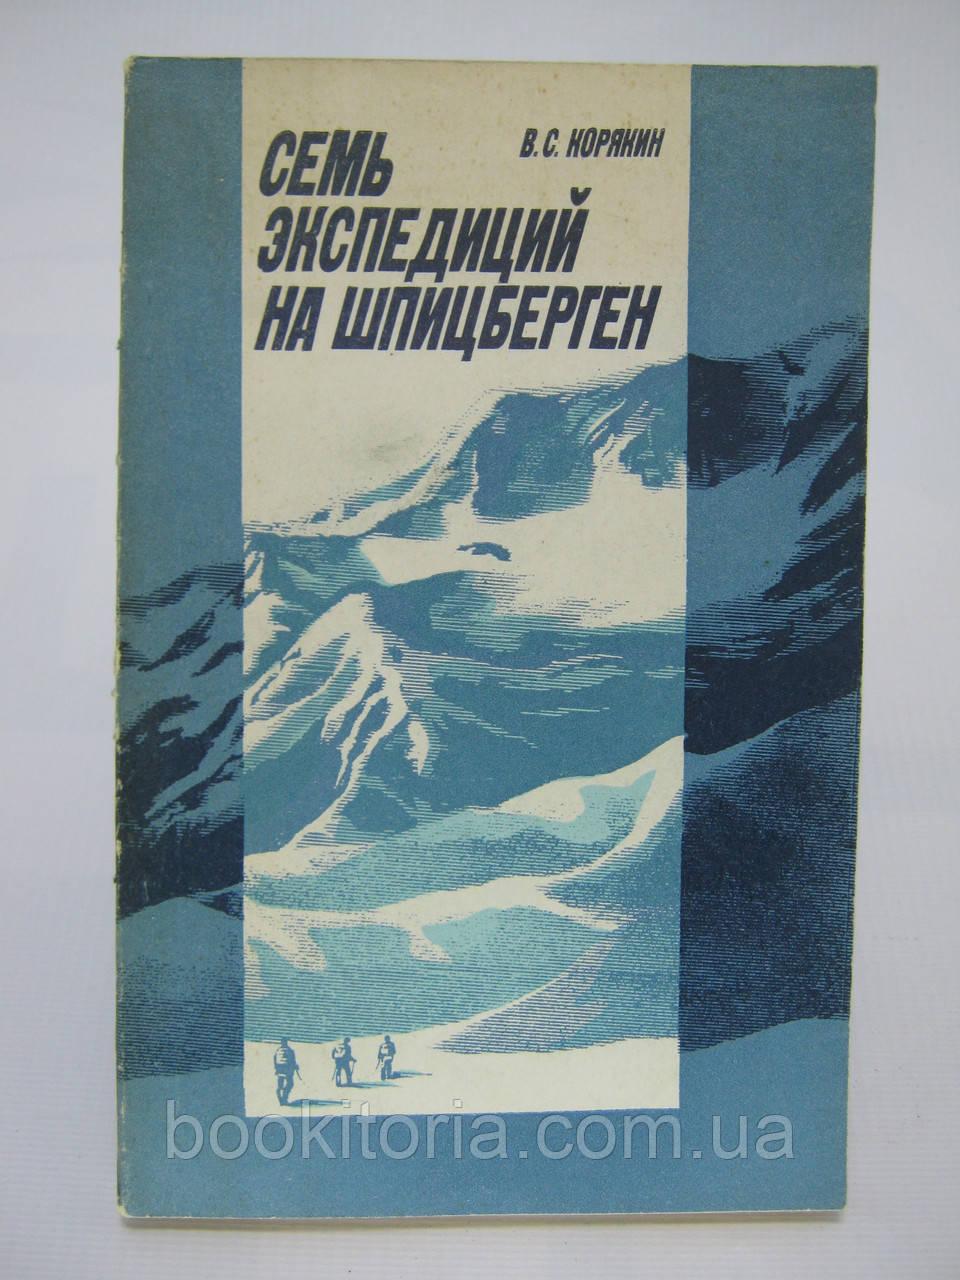 Корякин В.С. Семь экспедиций на Шпицберген (б/у).